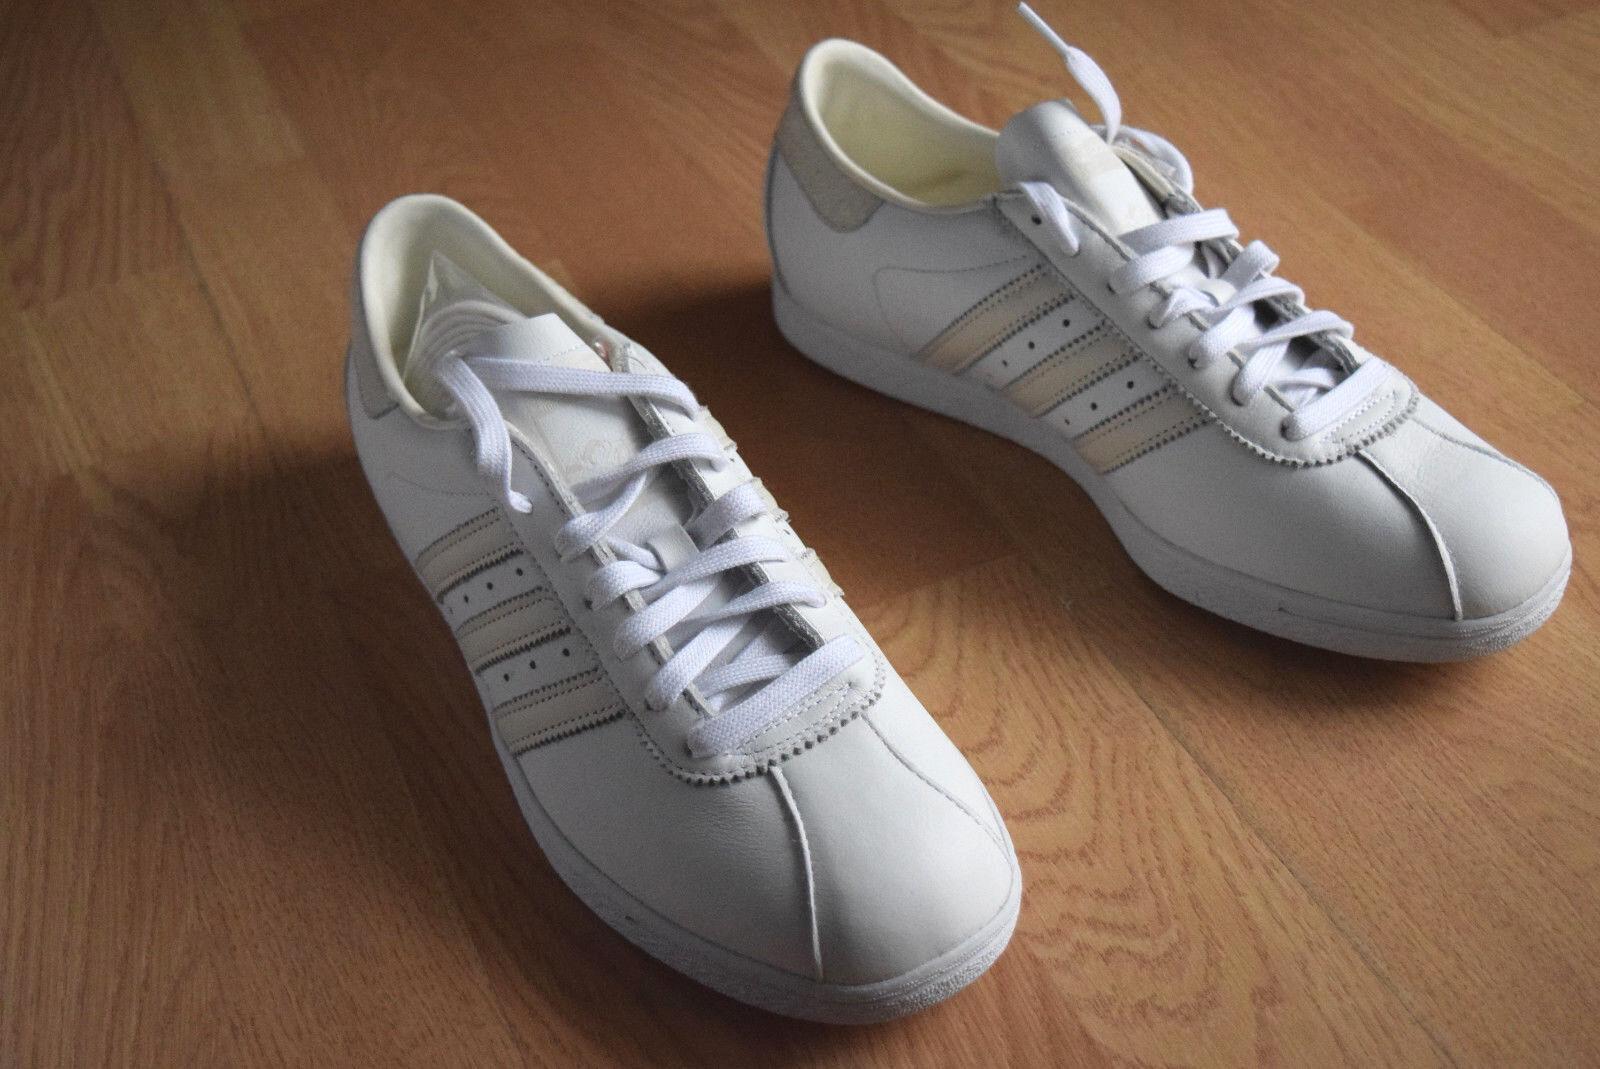 Adidas Tobacco 41 Blanc Mountaineering 40 41 Tobacco 43 44 46 47 aq3269 spécial Berne Rivea 4b8c05